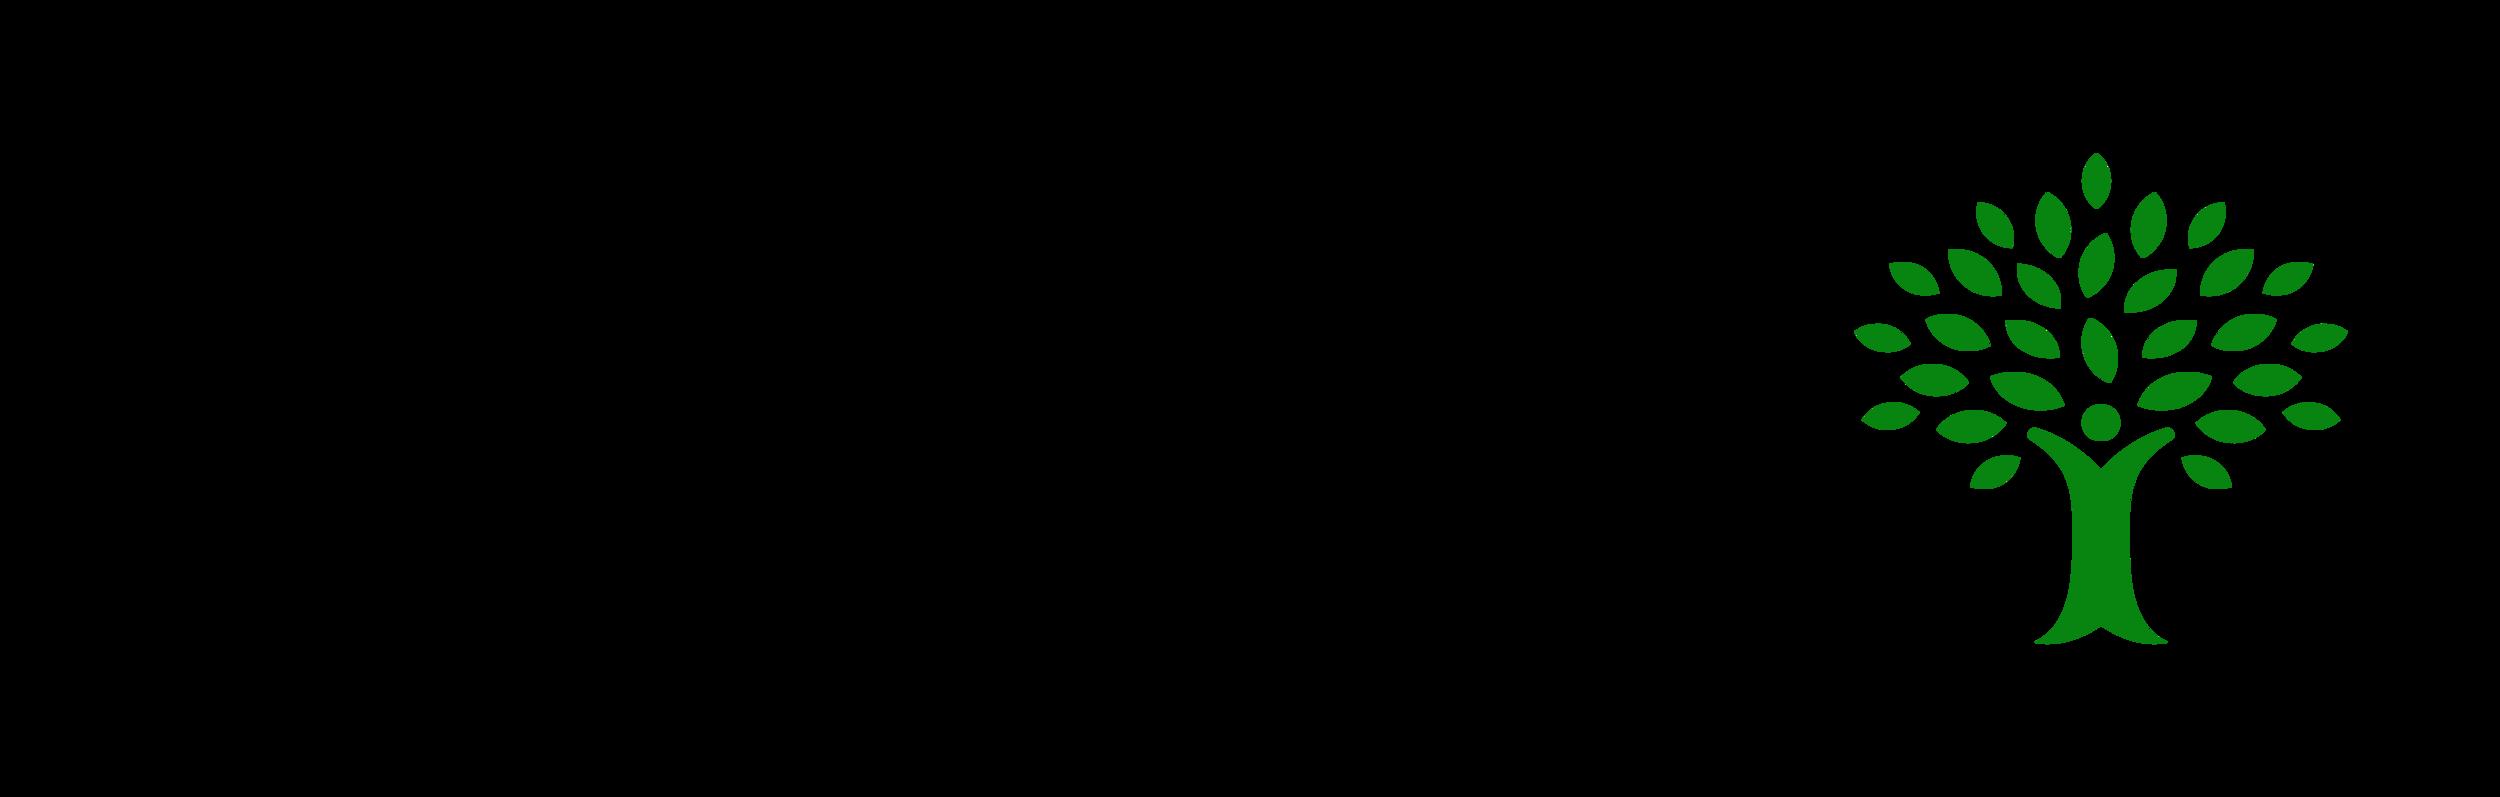 Chicago DBT-logo (1)R.png